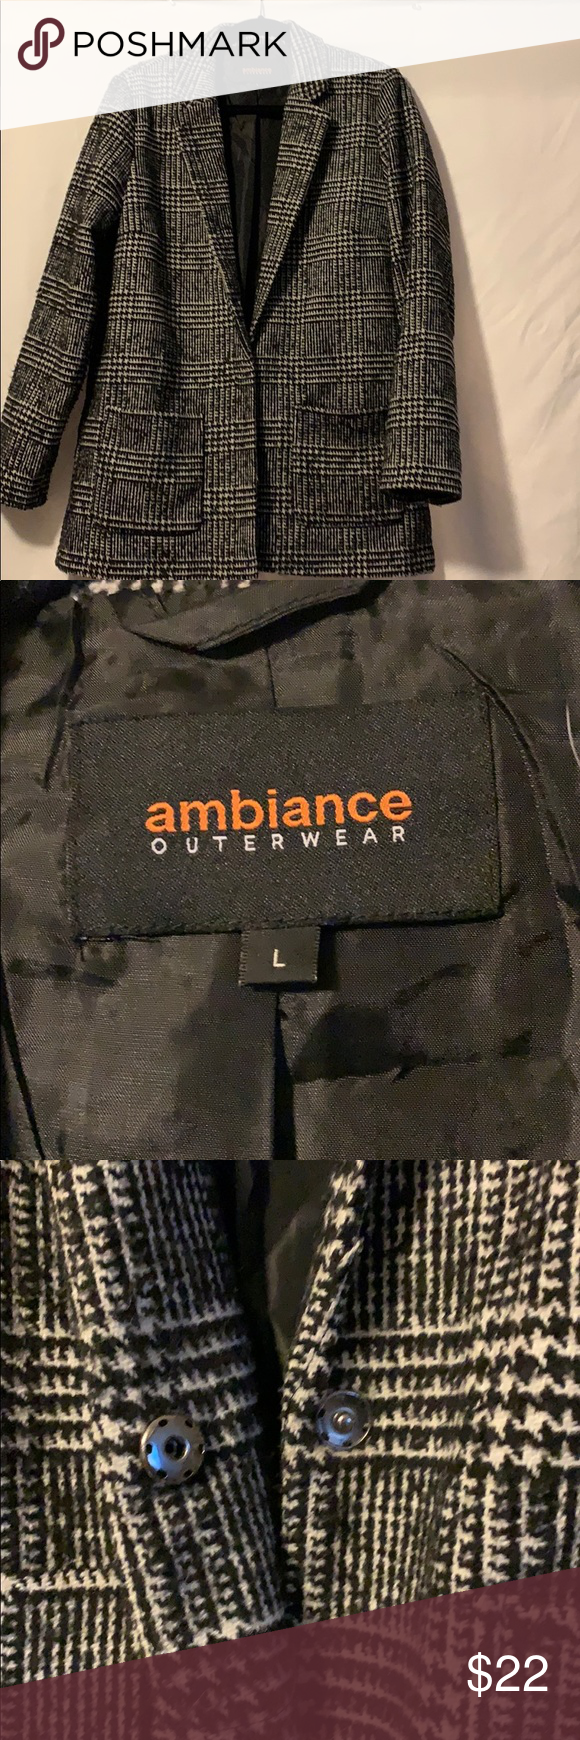 Ambiance Outerwear Jacket Outerwear Jackets Jackets Outerwear [ 1740 x 580 Pixel ]